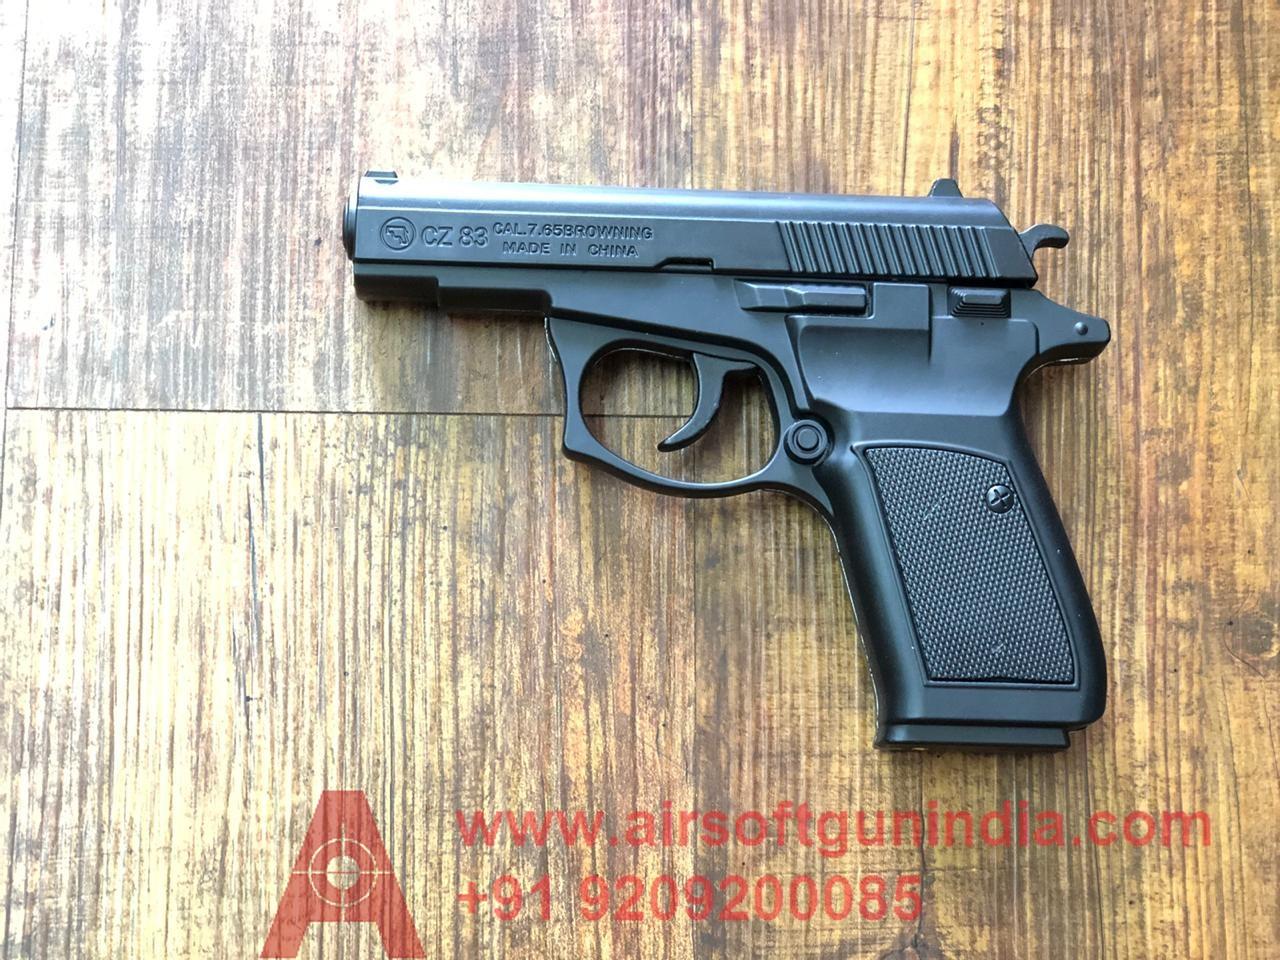 CZ 83 Browning Black Cigarette  Lighter Gun In India